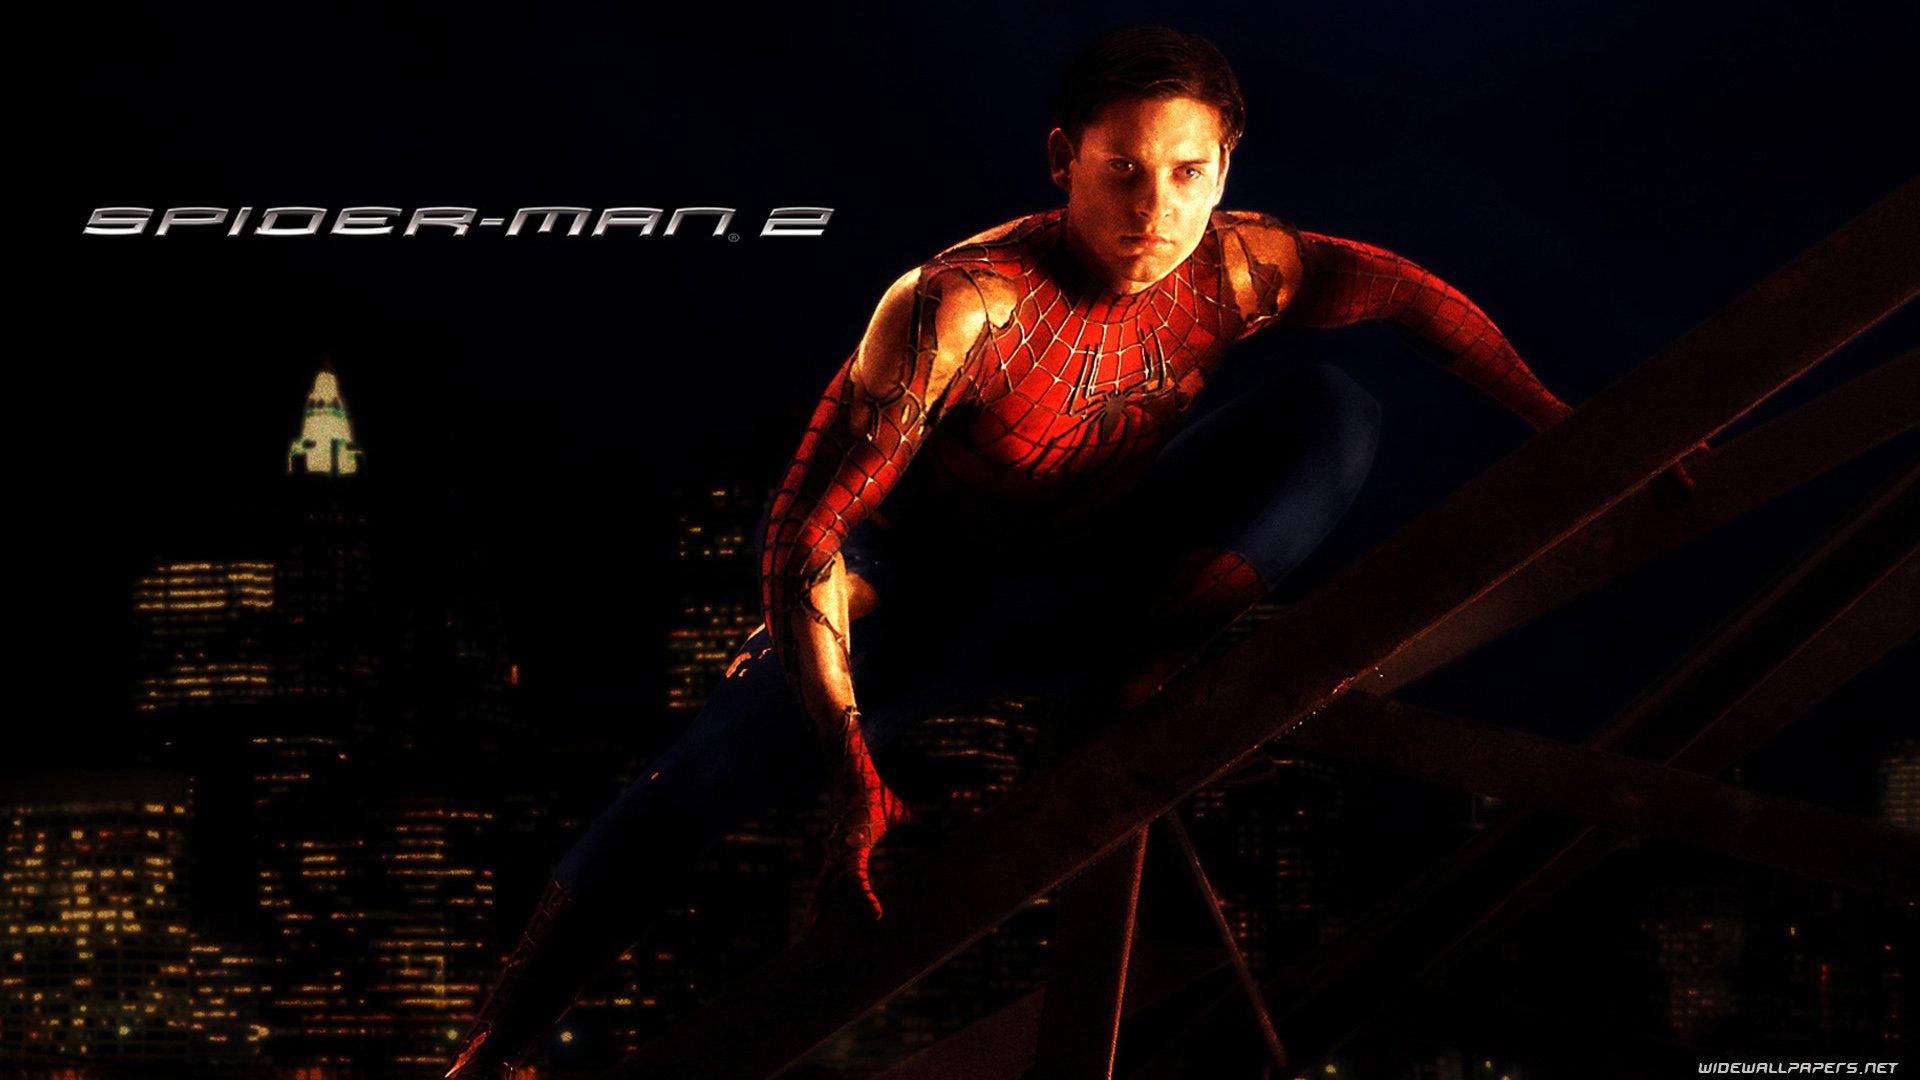 Spider Man 2 Hd Wallpaper Background Image 1920x1080 Id 457872